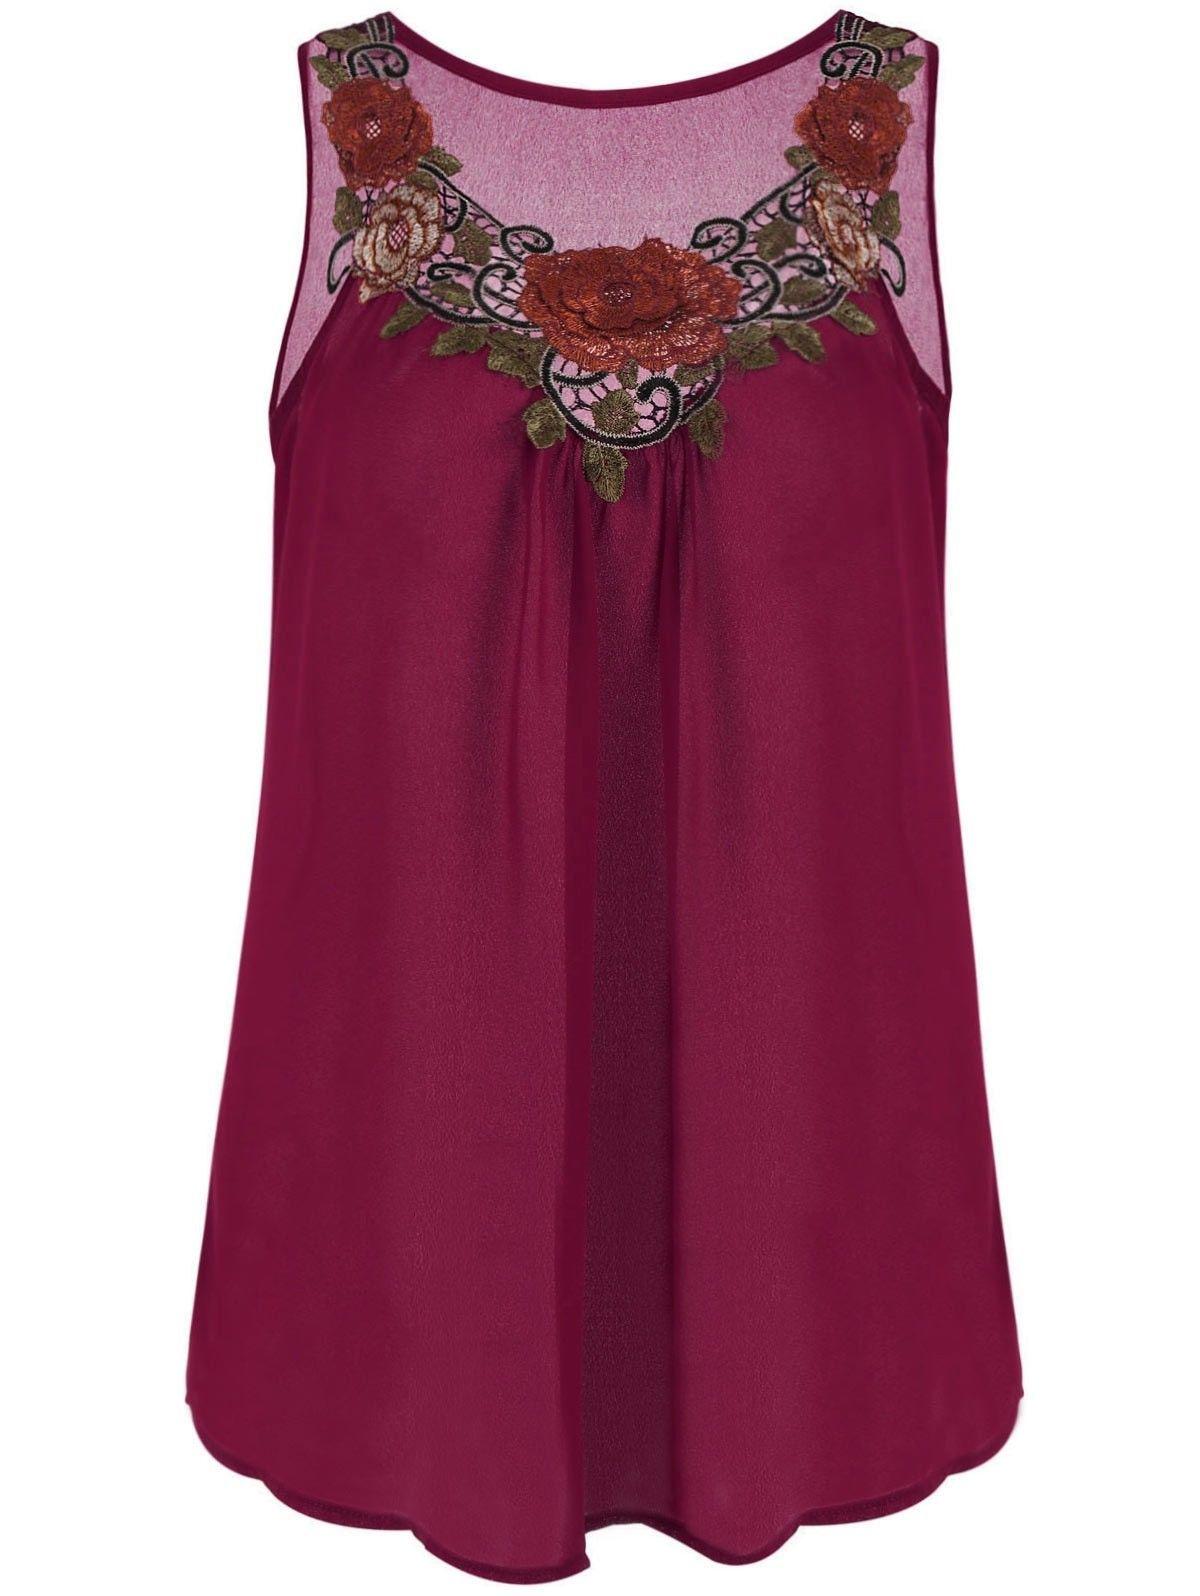 81643f703d3  8.99 - Women Ladies Plus Size Chiffon Top Shirt Embroidered Sleeveless Top  Shirt  ebay  Fashion